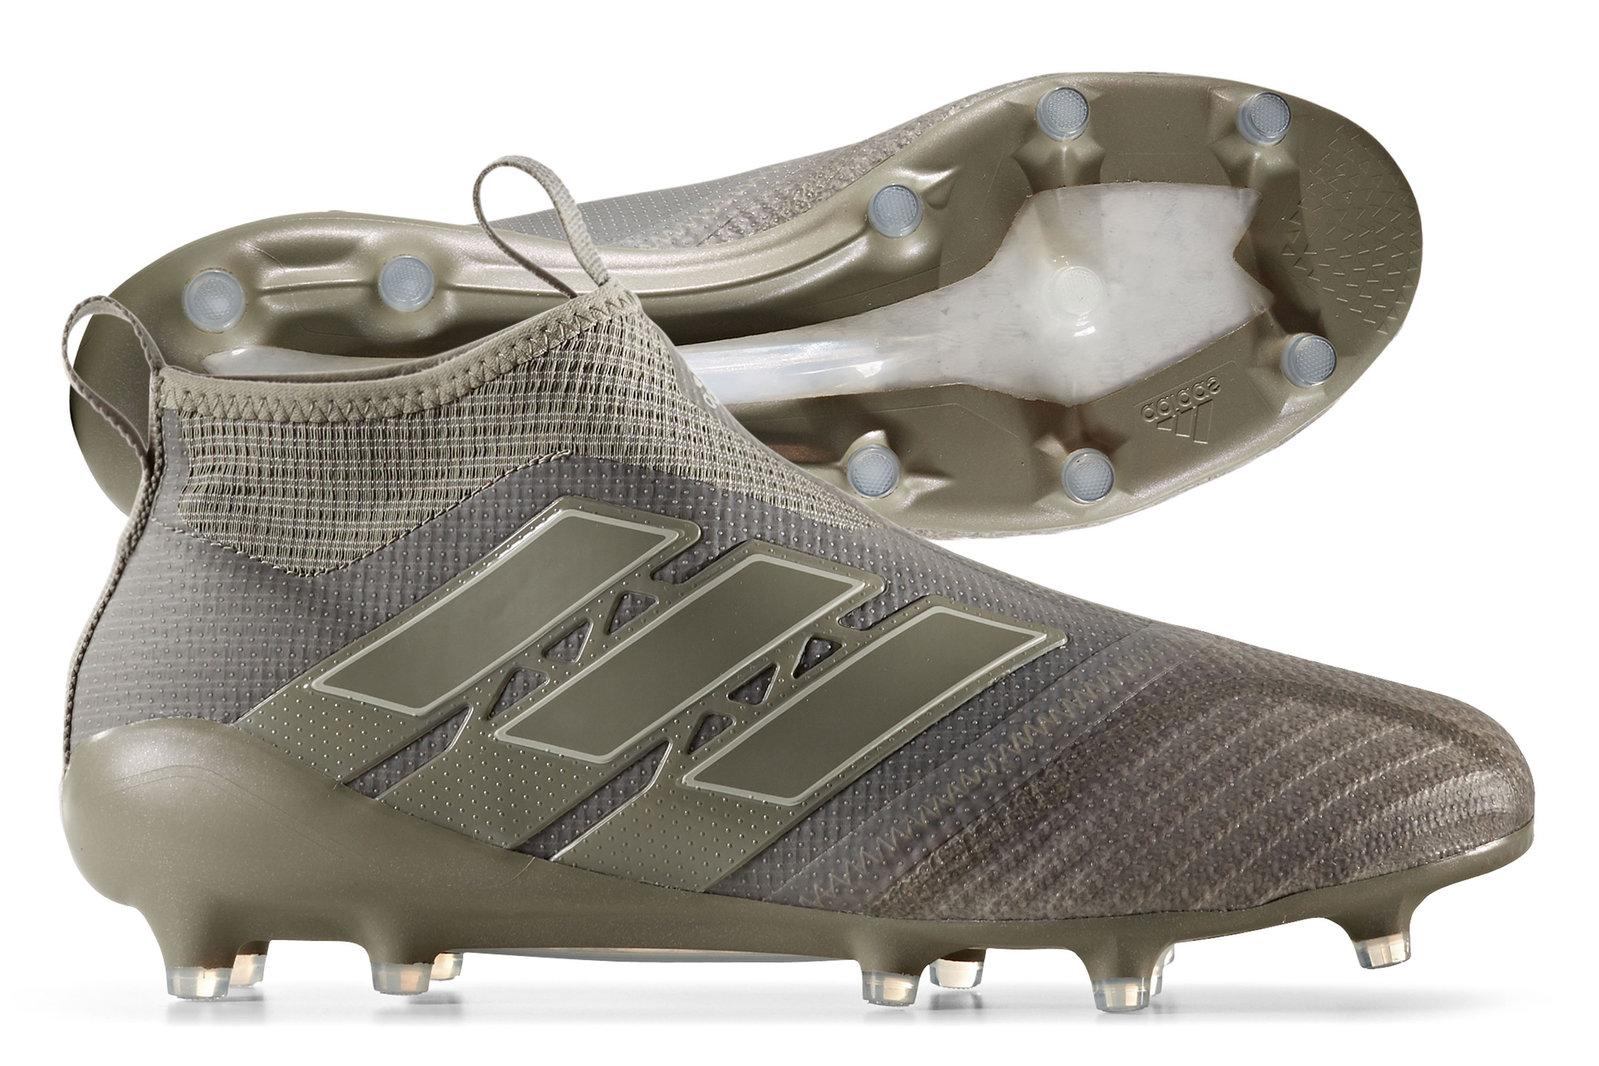 c484f54c2283 adidas Ace 17+ Pure Control FG Football Boots | eBay